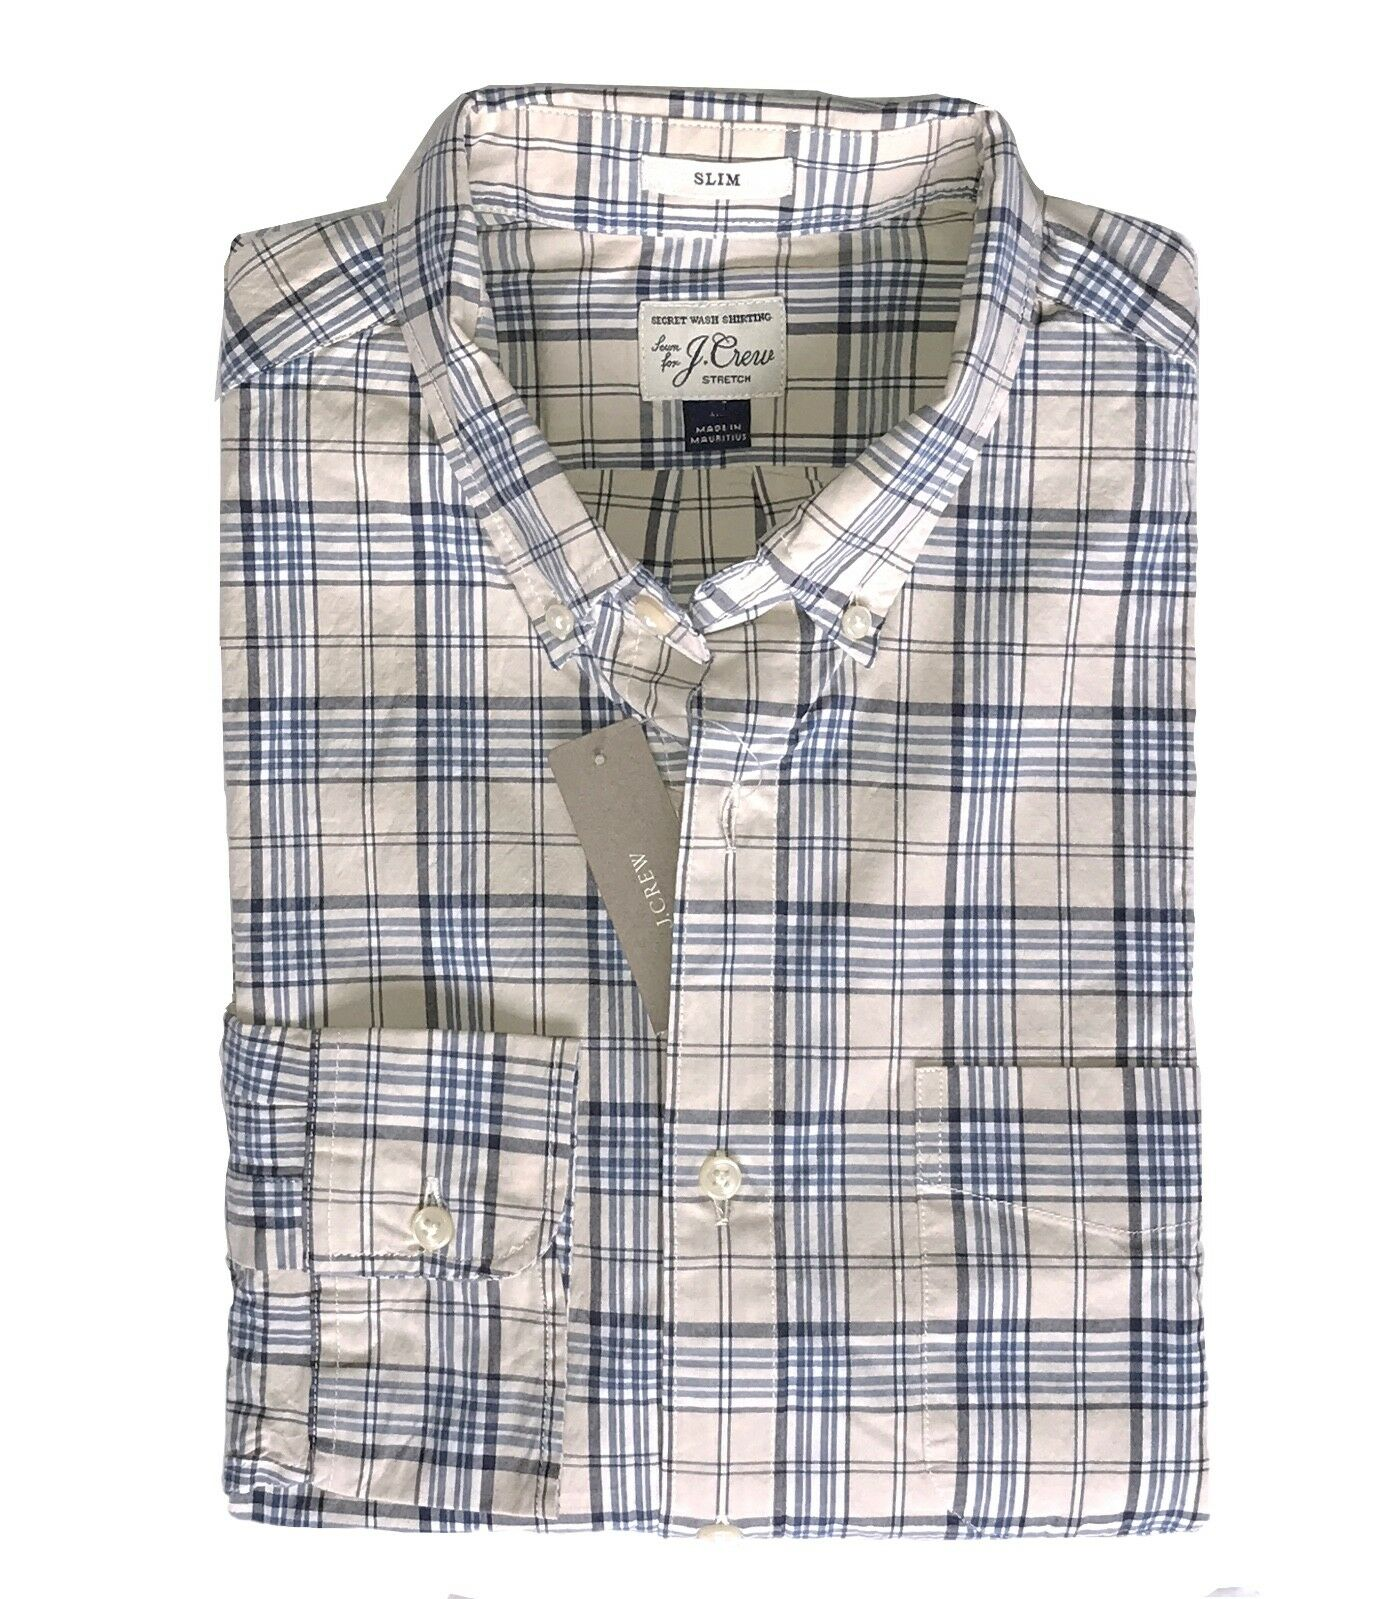 J Crew - Mens L Slim Fit - NWT - bluee Khaki Beige Plaid Secret Wash Cotton Shirt